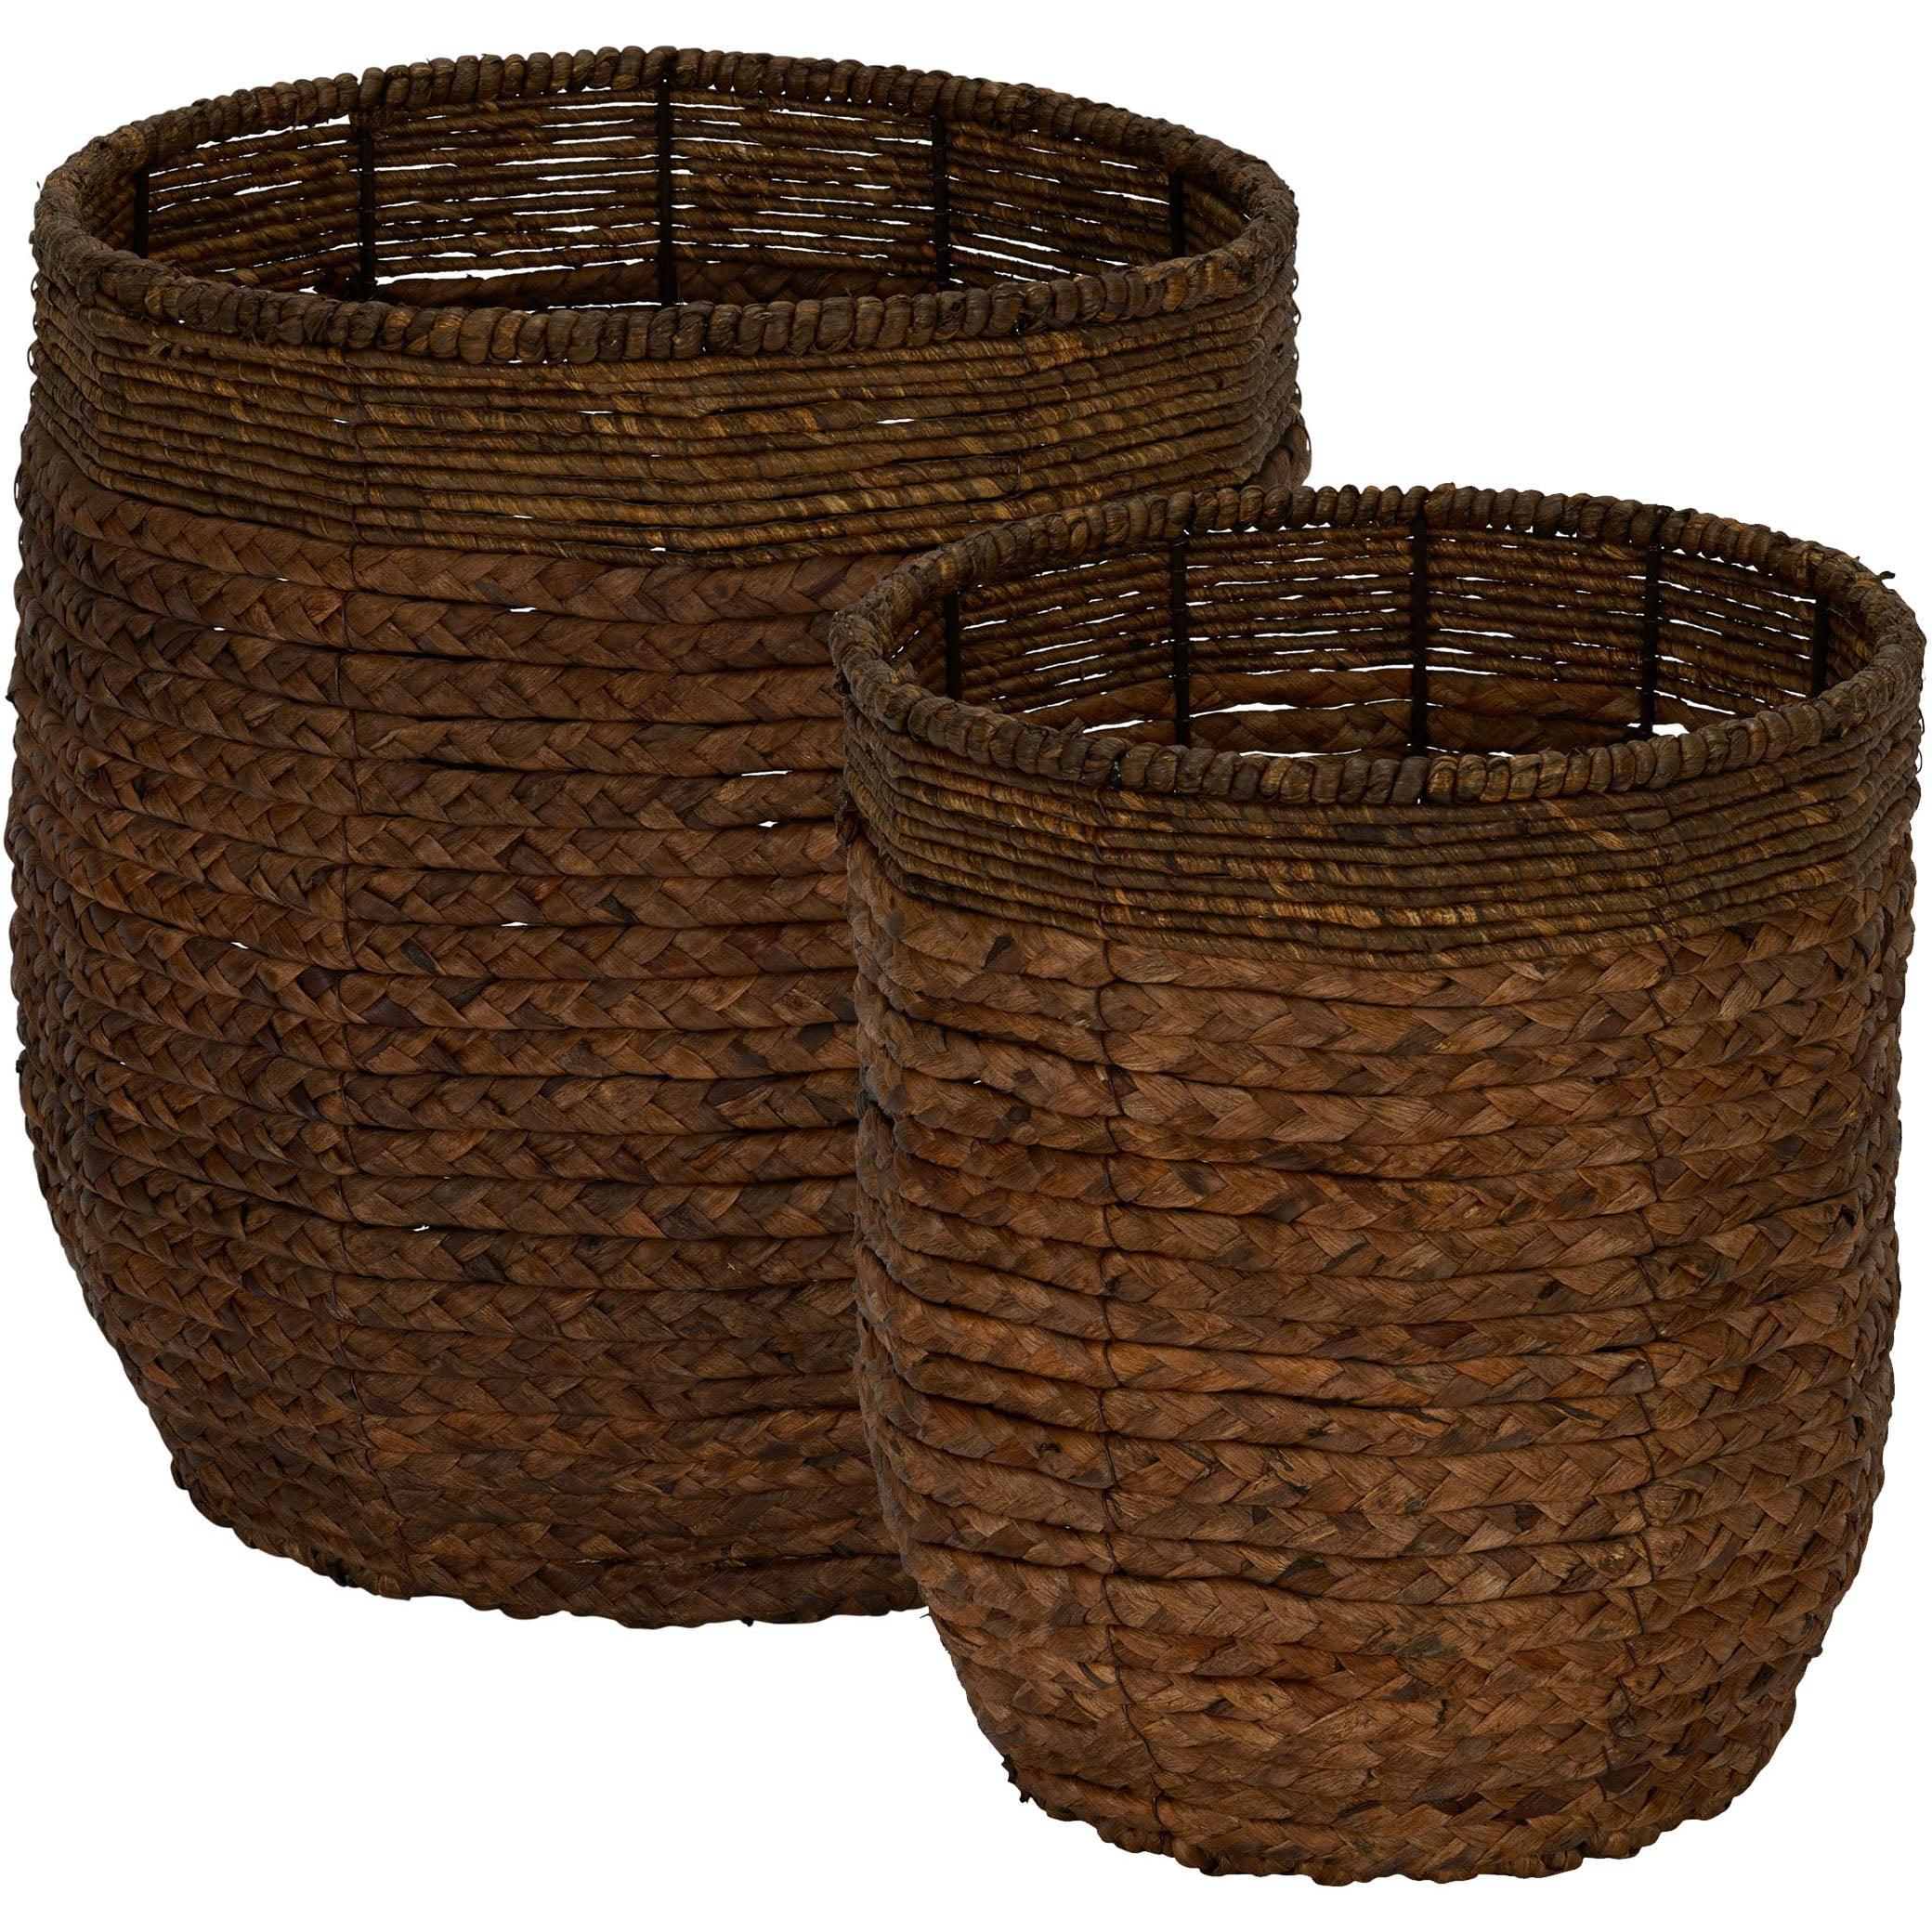 HOUSEHOLD ESSENTIALS Rimmed Blended-Weave Wicker Baskets, Set, of 2